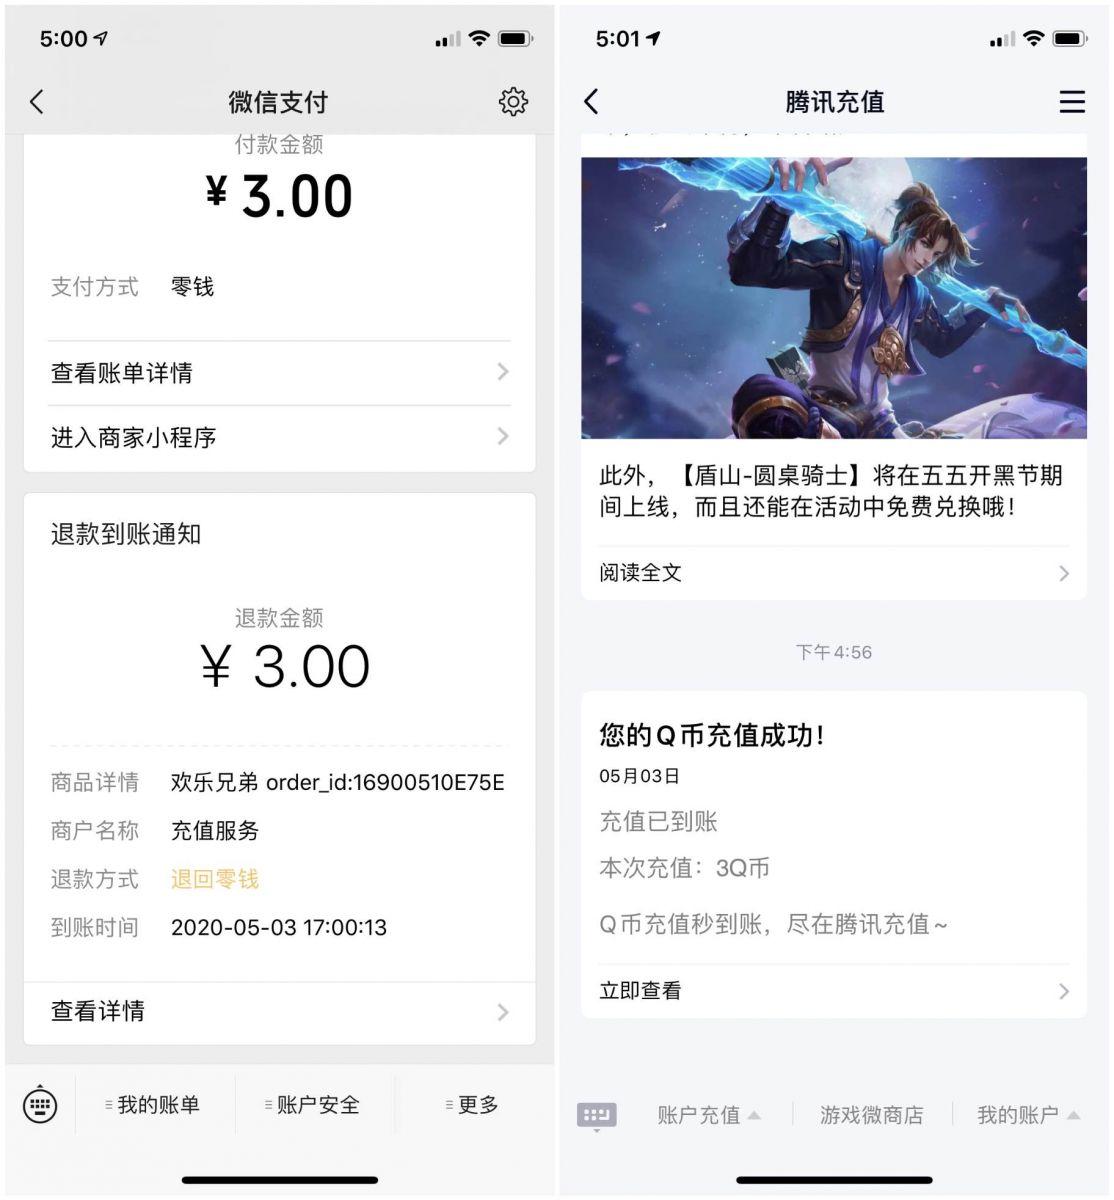 WeGame初夏活动免费领取8Q币 亲测秒撸3Q币